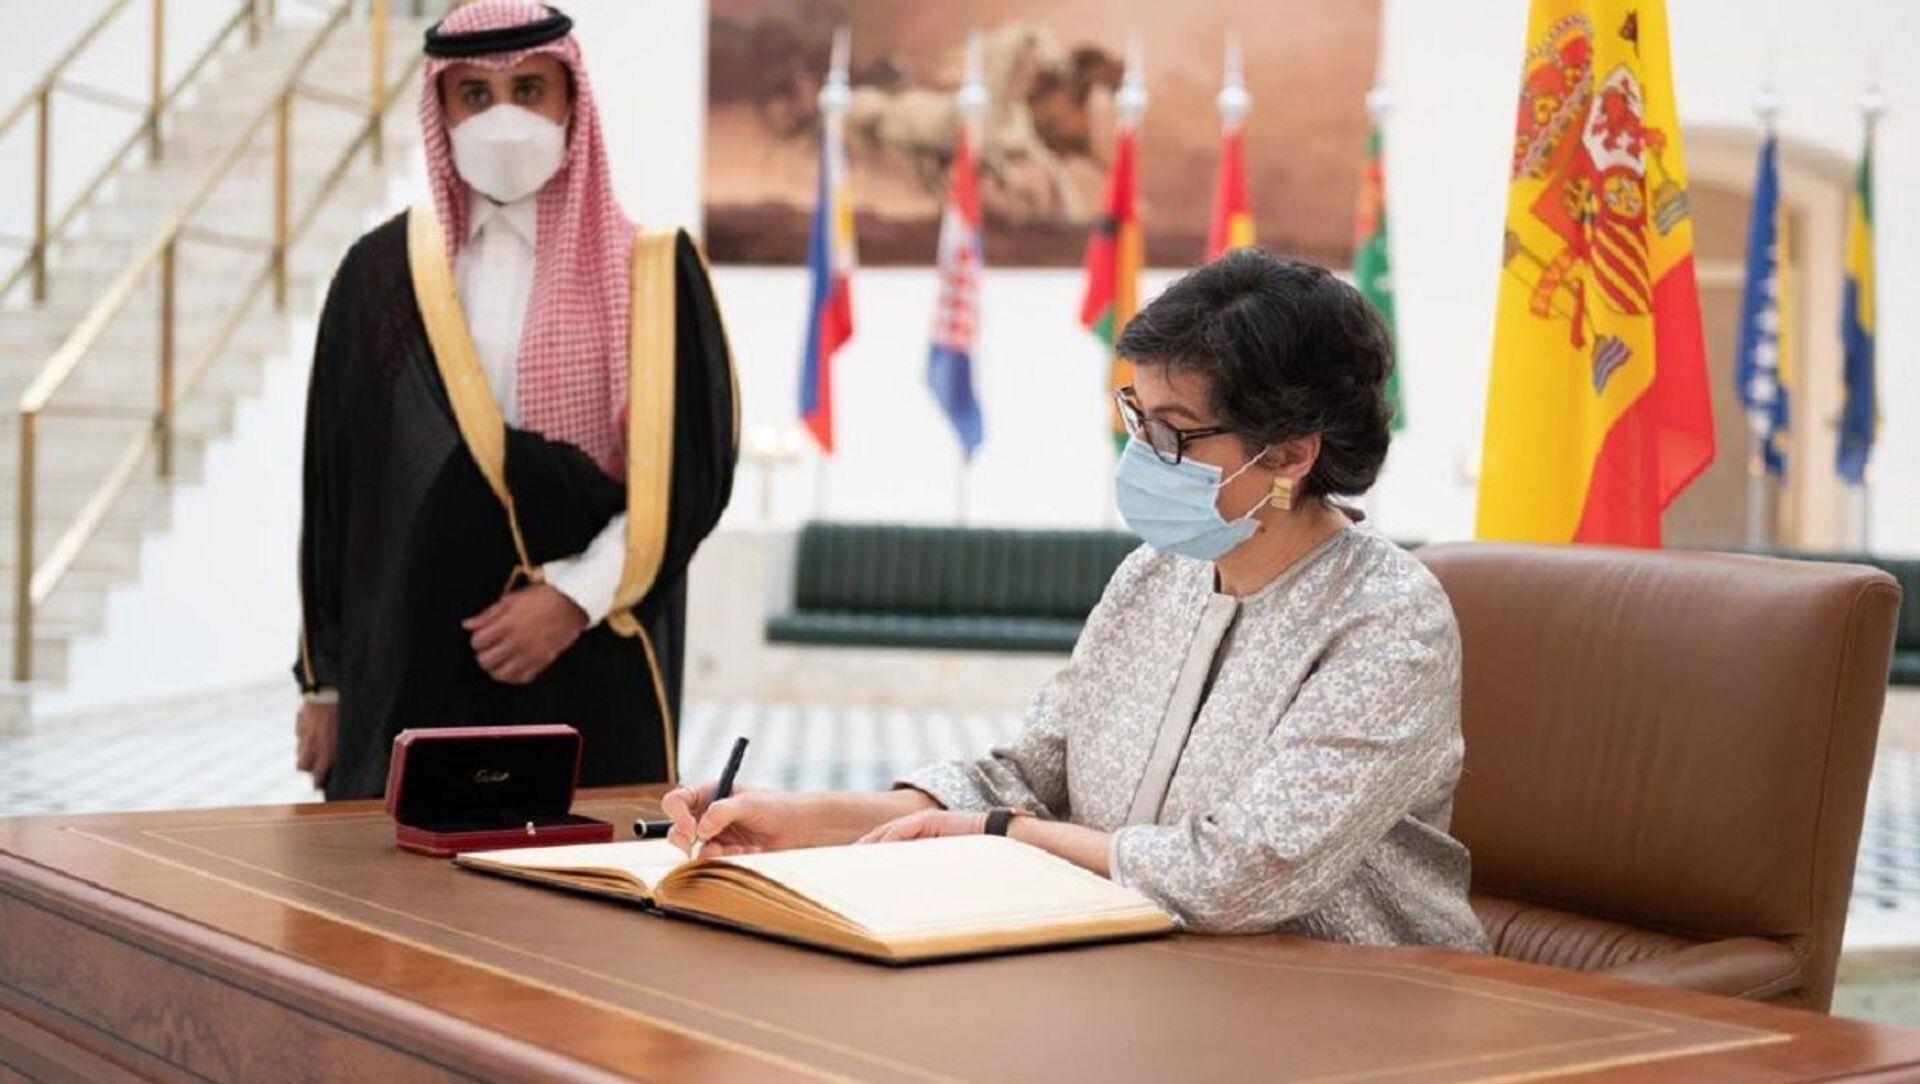 Arancha González Laya, la Ministra de Asuntos Exteriores de España, en Arabia Saudí - Sputnik Mundo, 1920, 09.02.2021